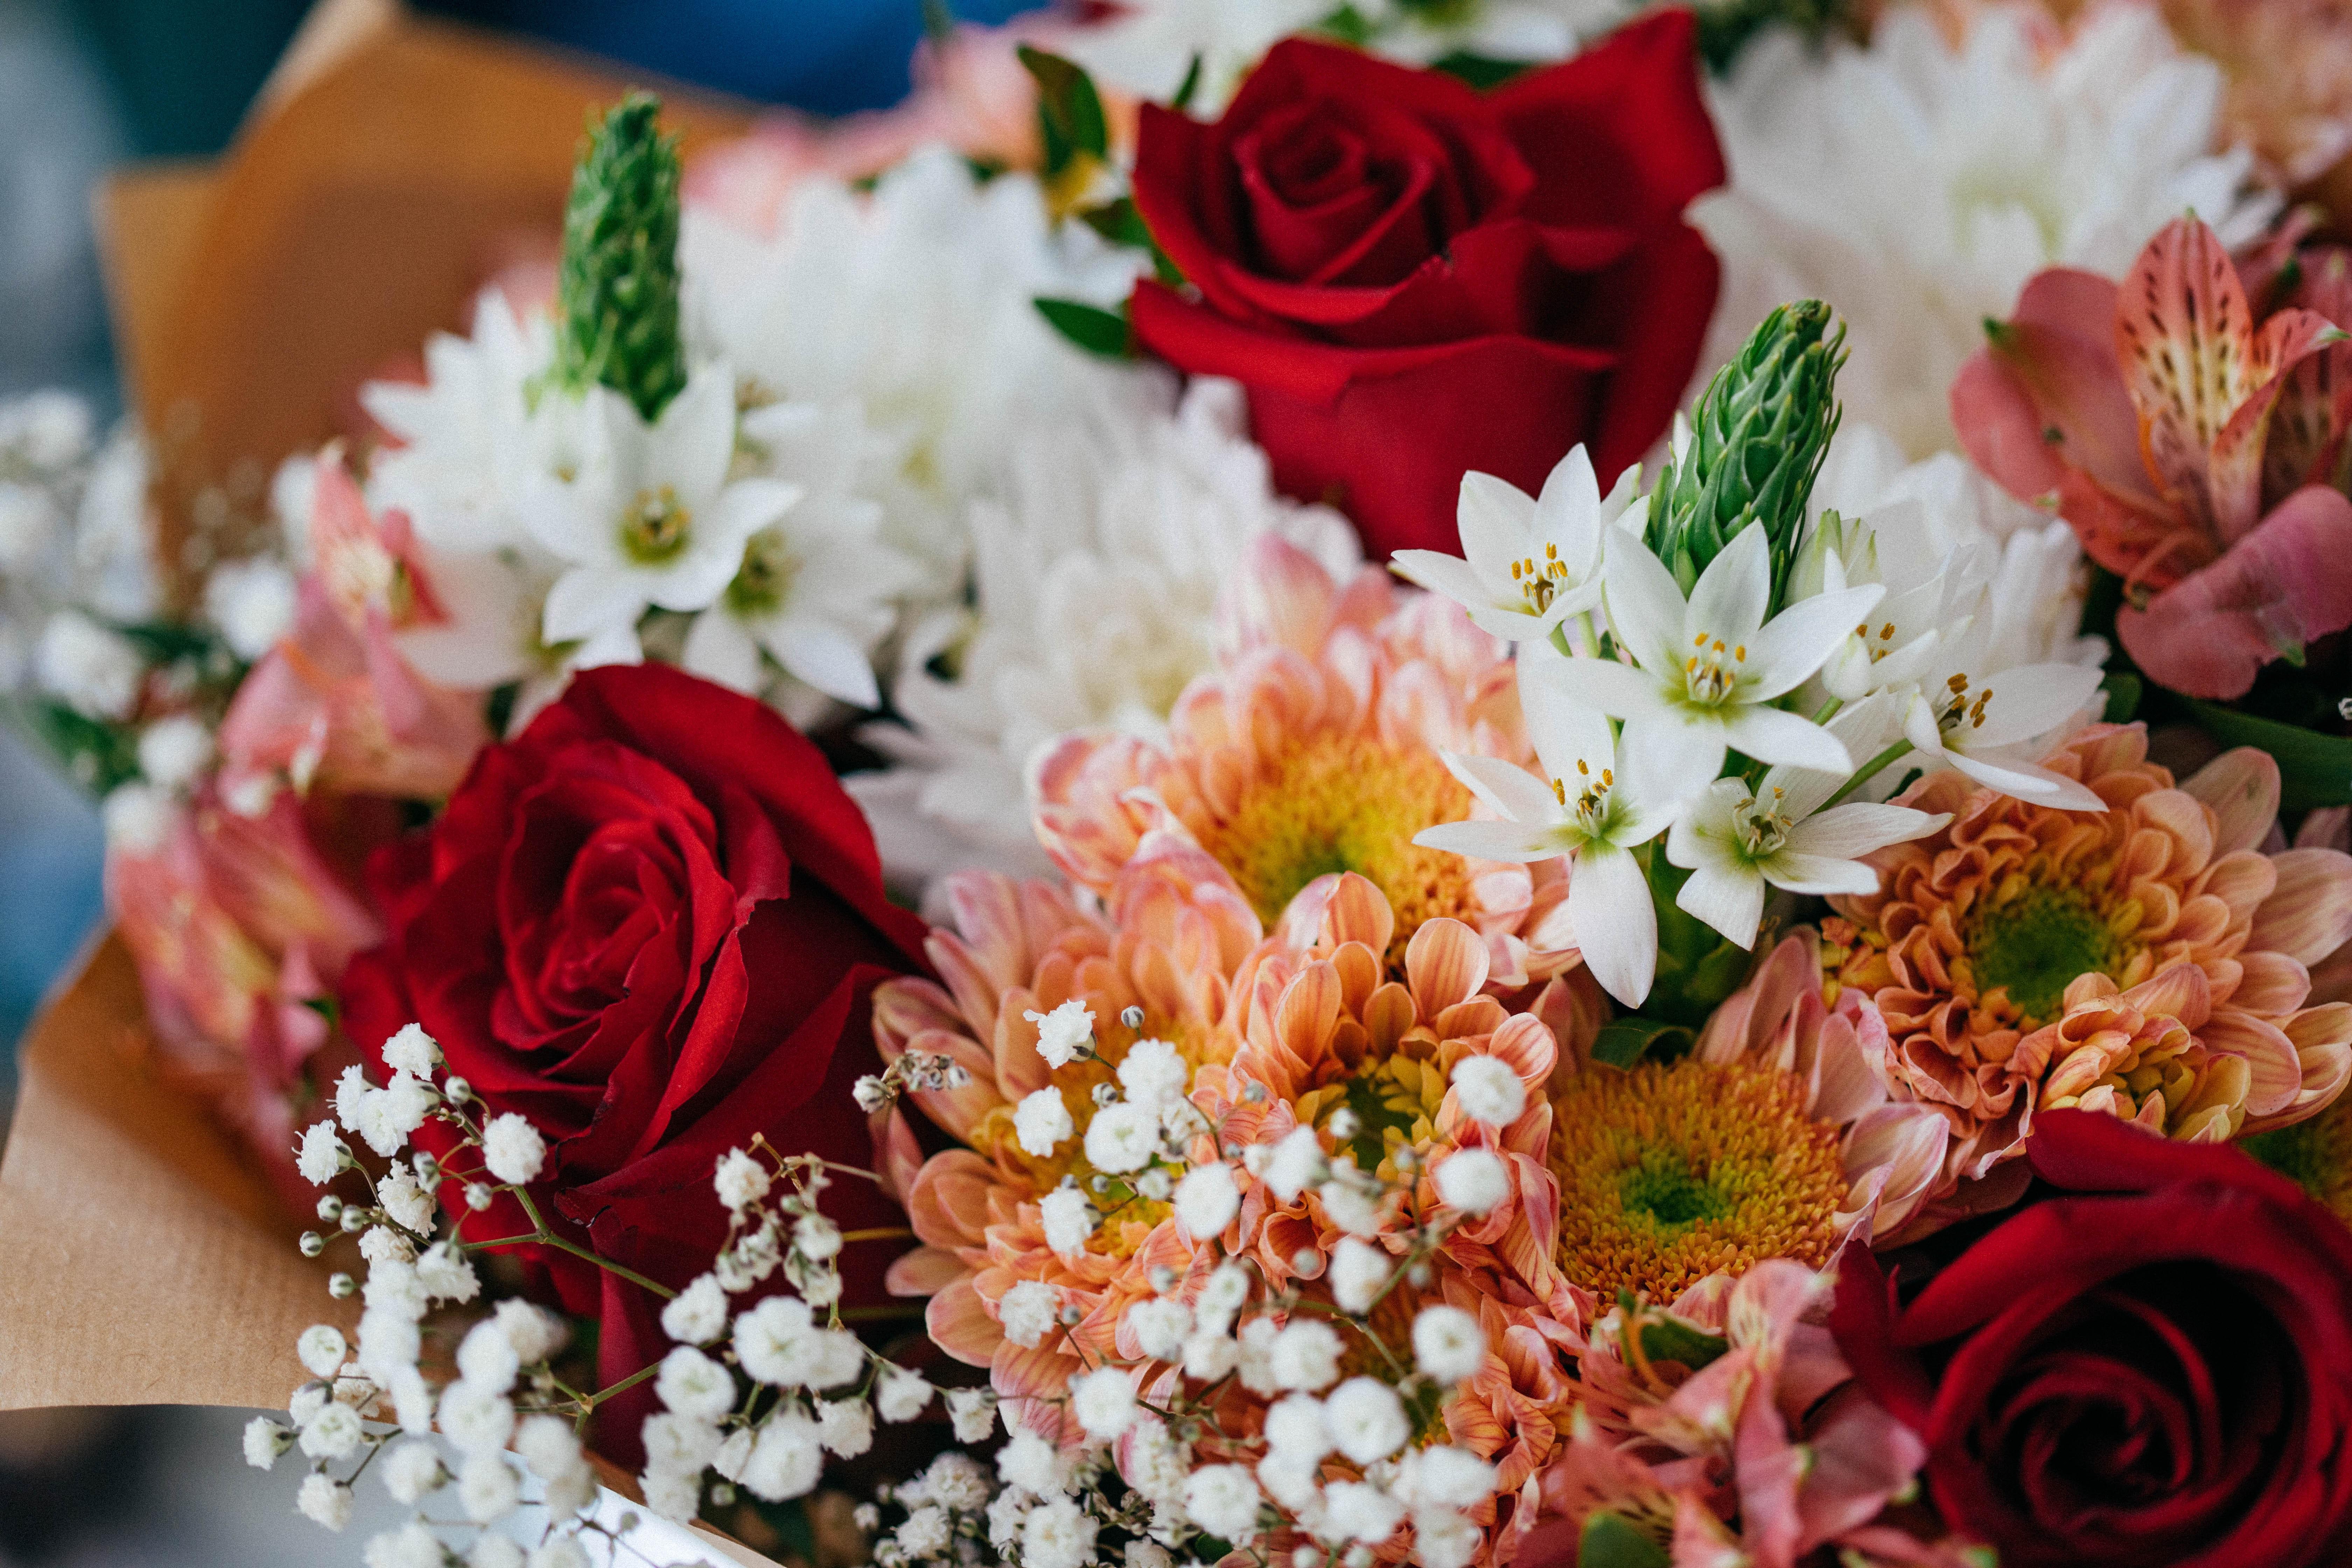 1000 Engaging Flower Bouquet Photos Pexels Free Stock Photos